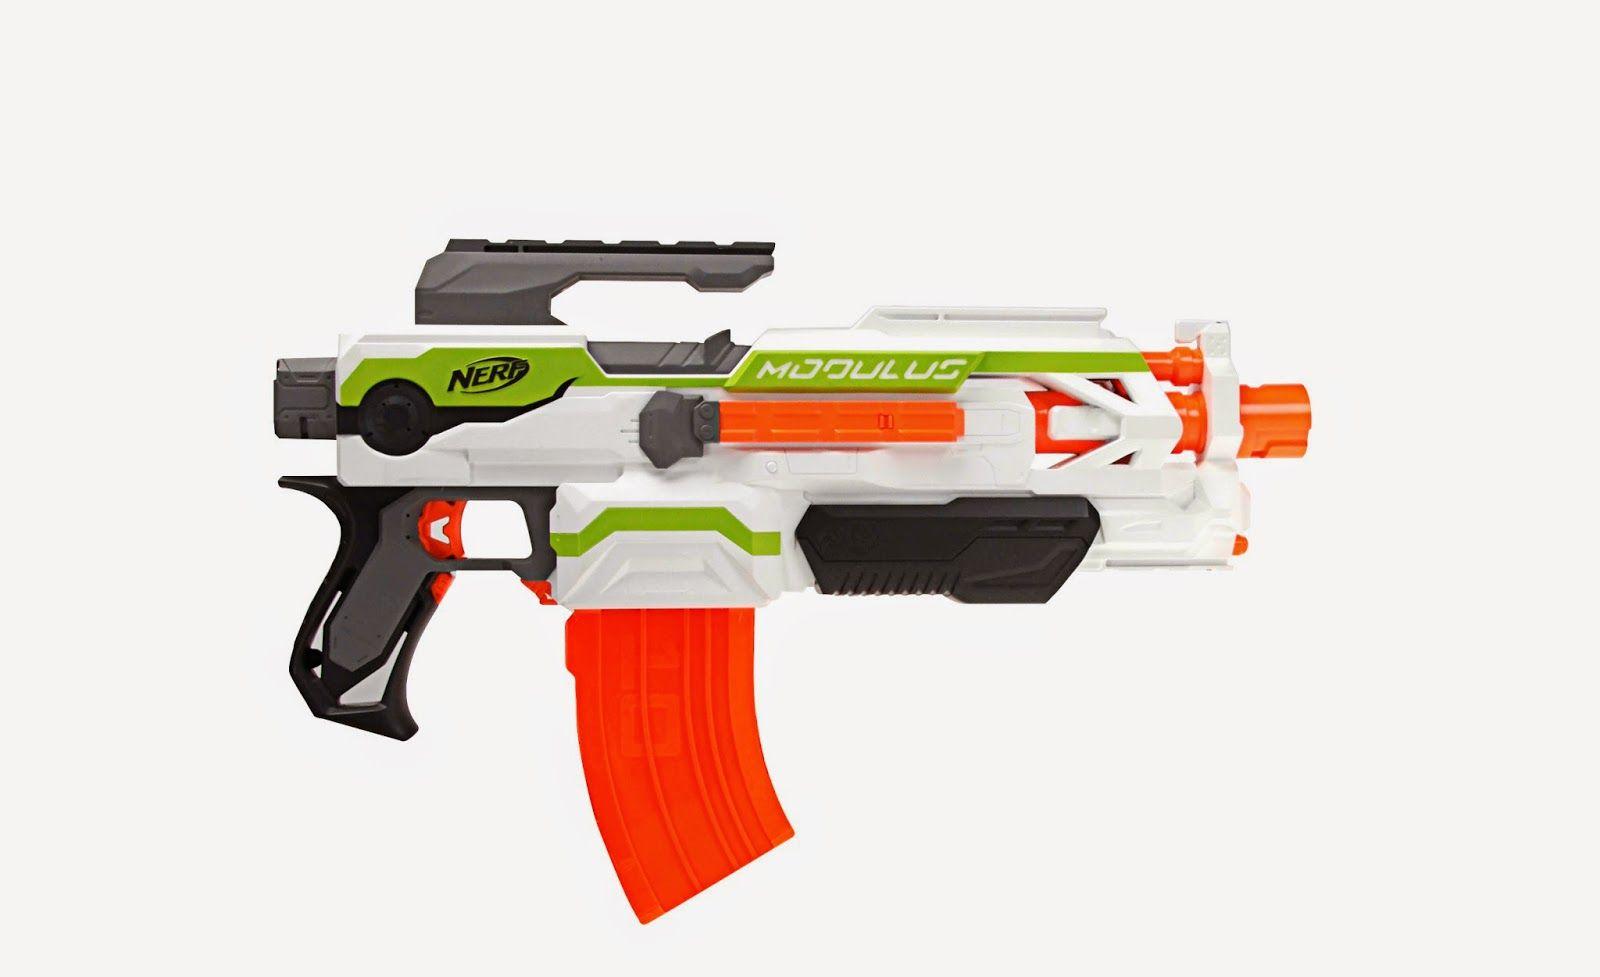 new nerf guns 2015 zombie strike Awesomely Nerf Nerf News New Nerf 2015  Blasters Rebelle photos